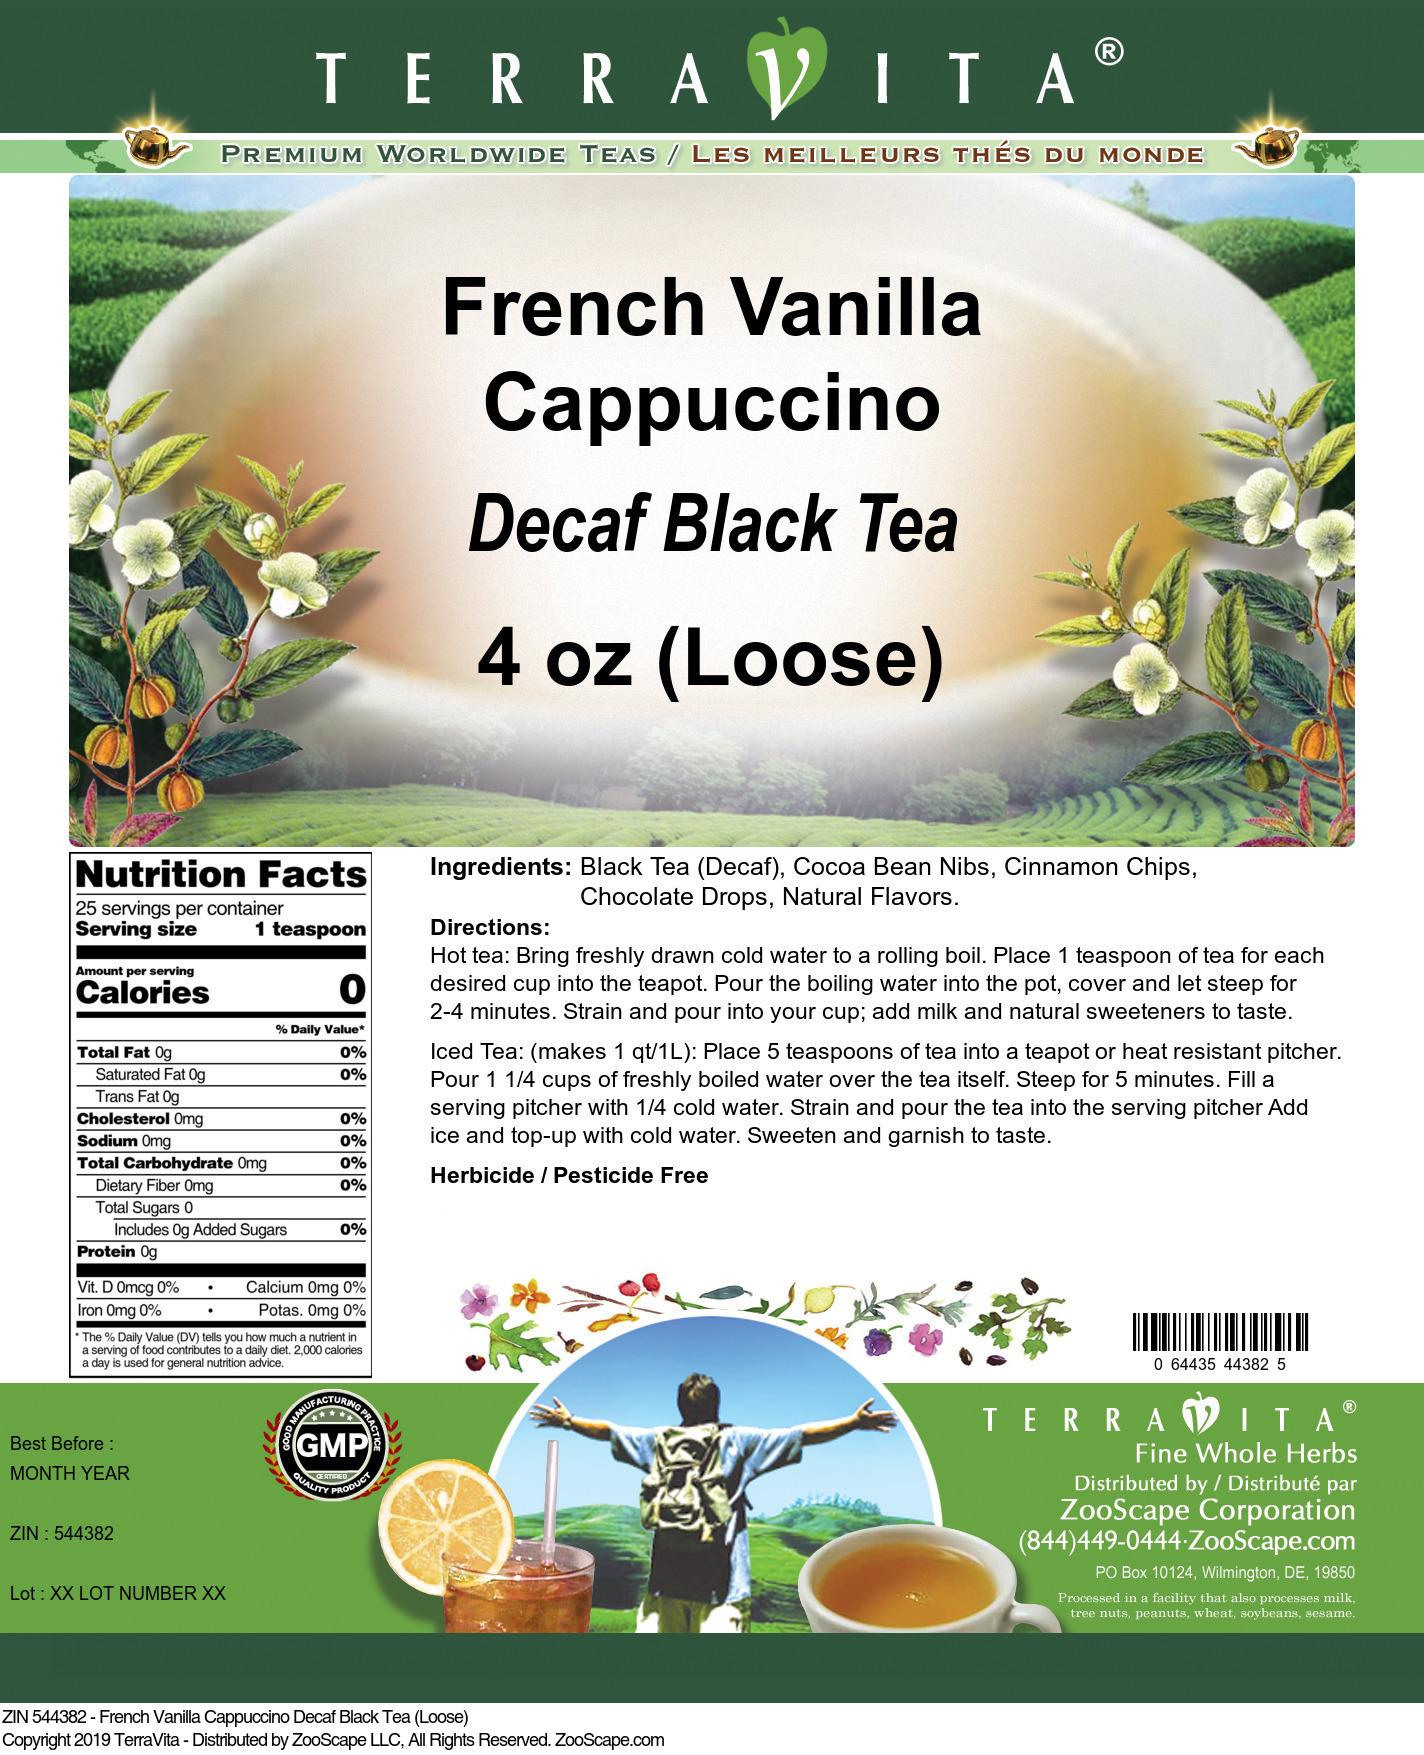 French Vanilla Cappuccino Decaf Black Tea (Loose)